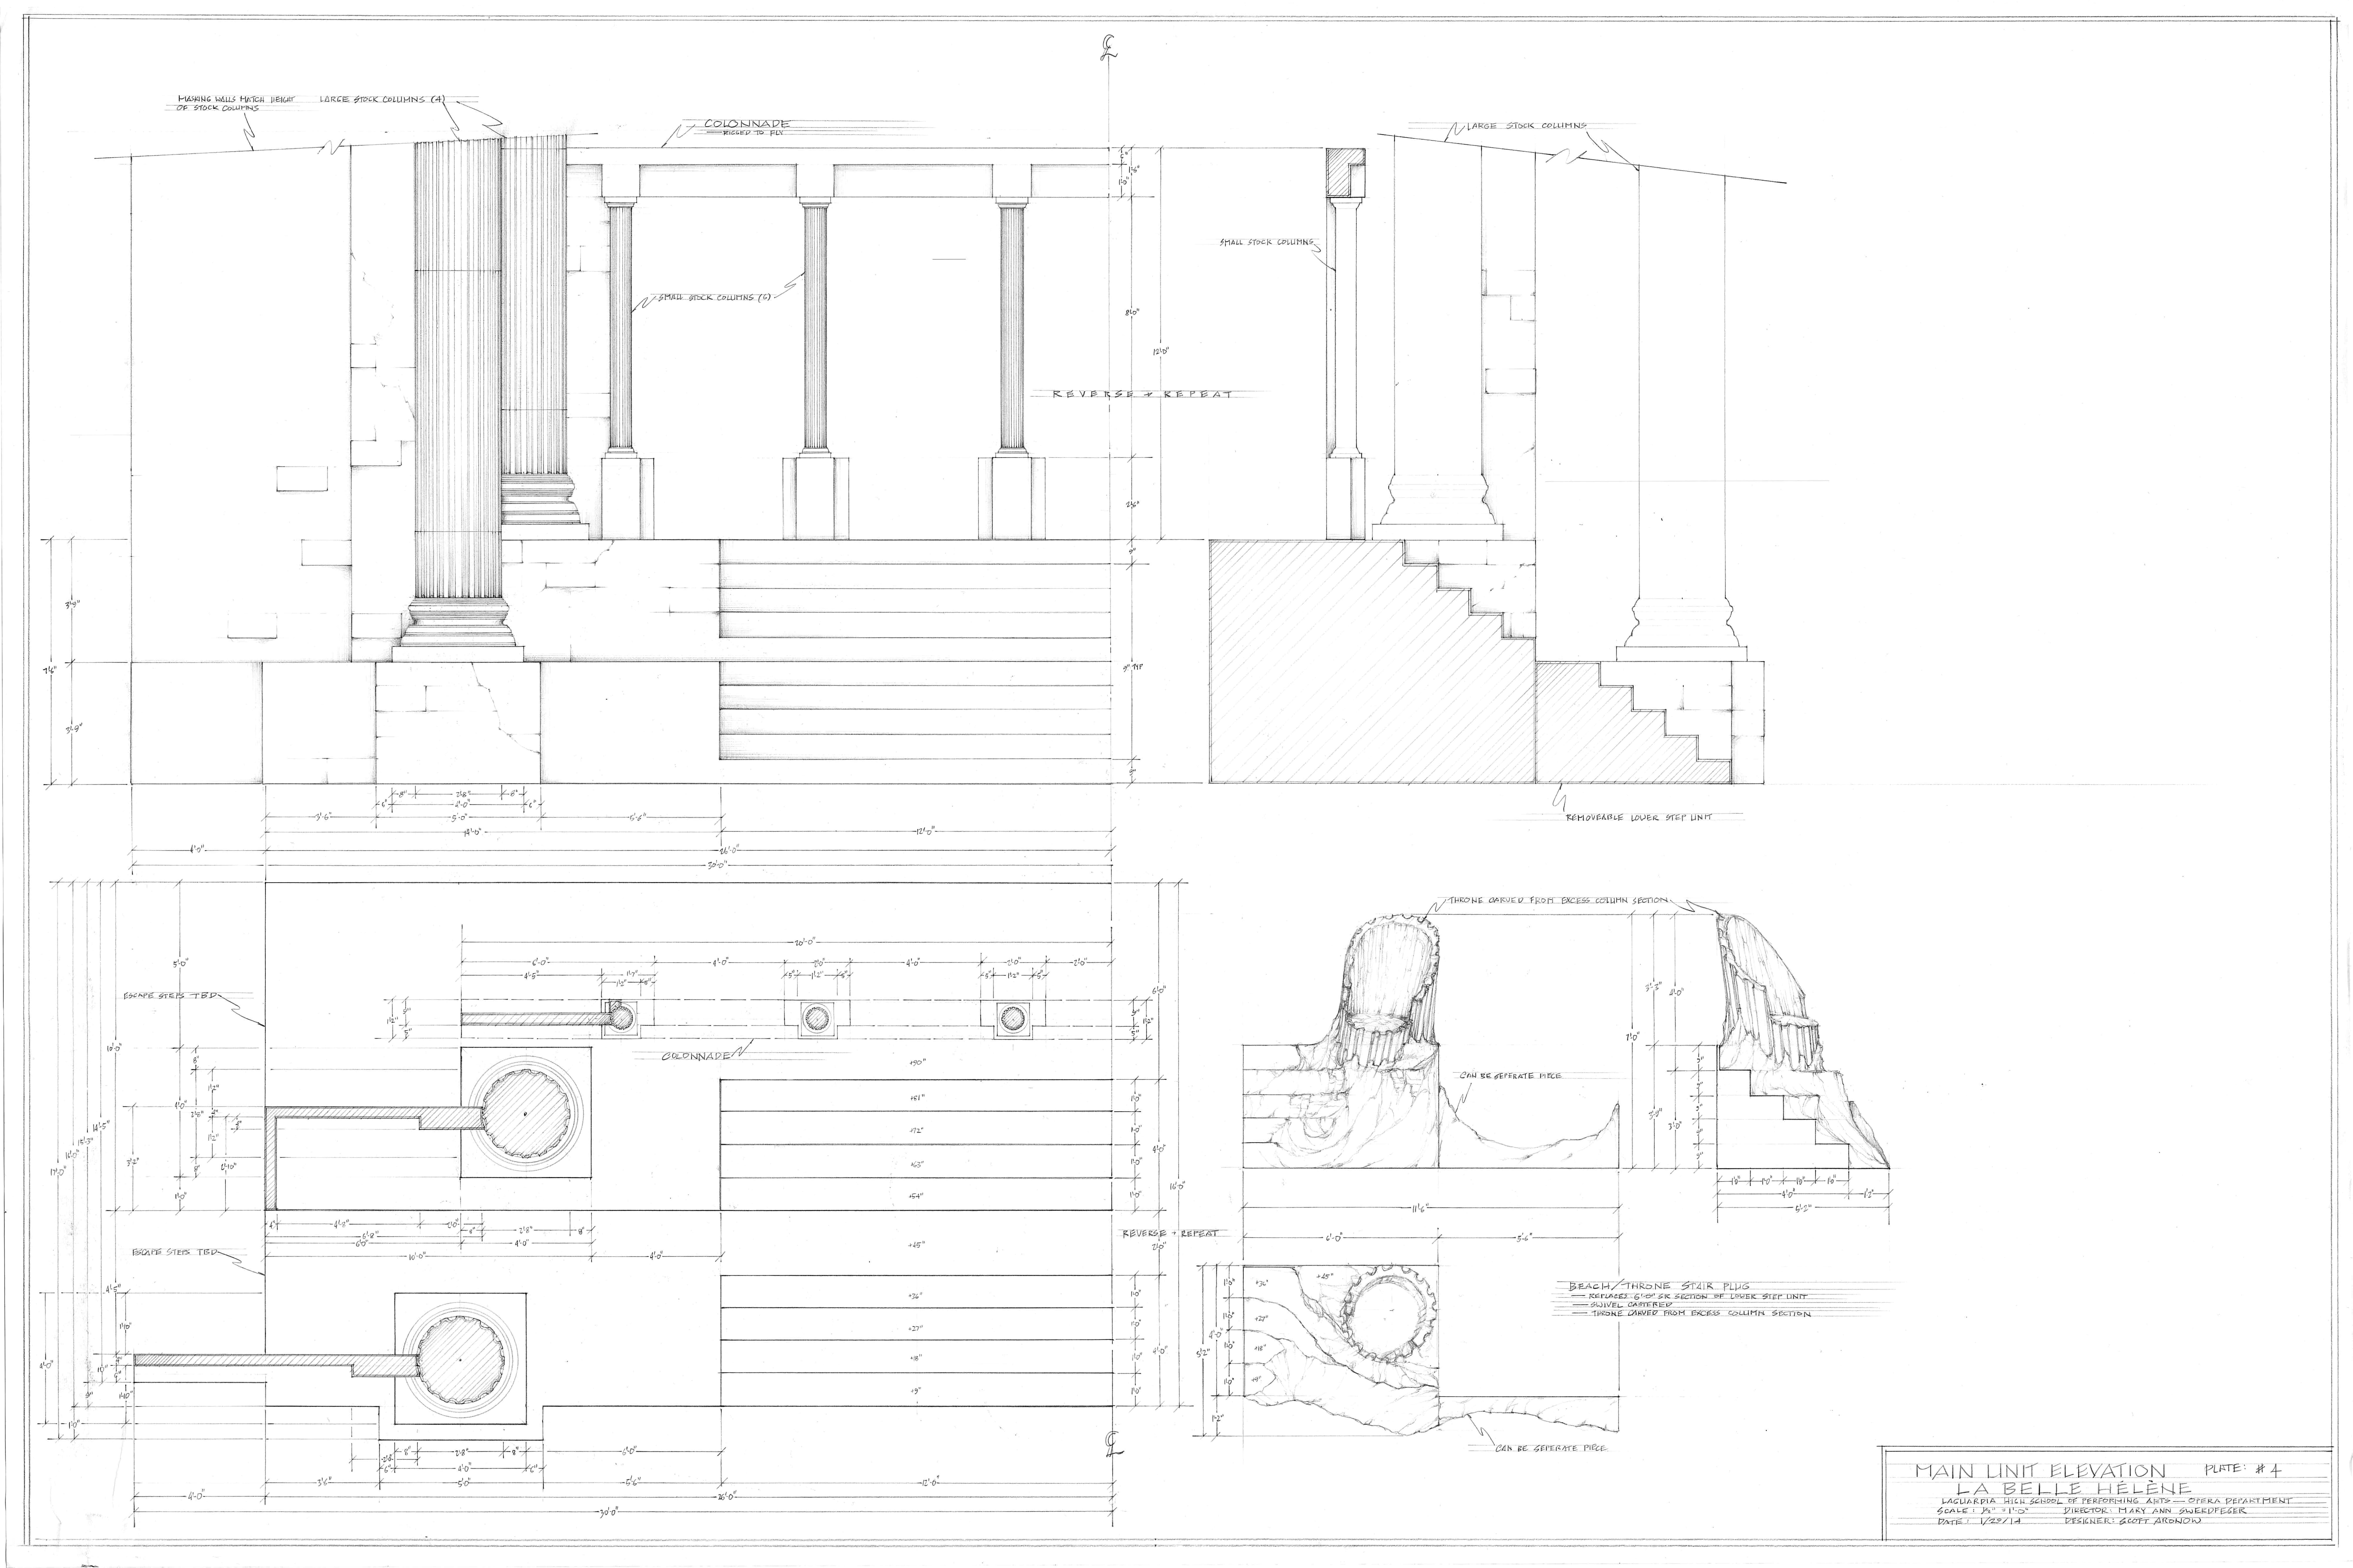 Plate #4. Main Unit Elevation